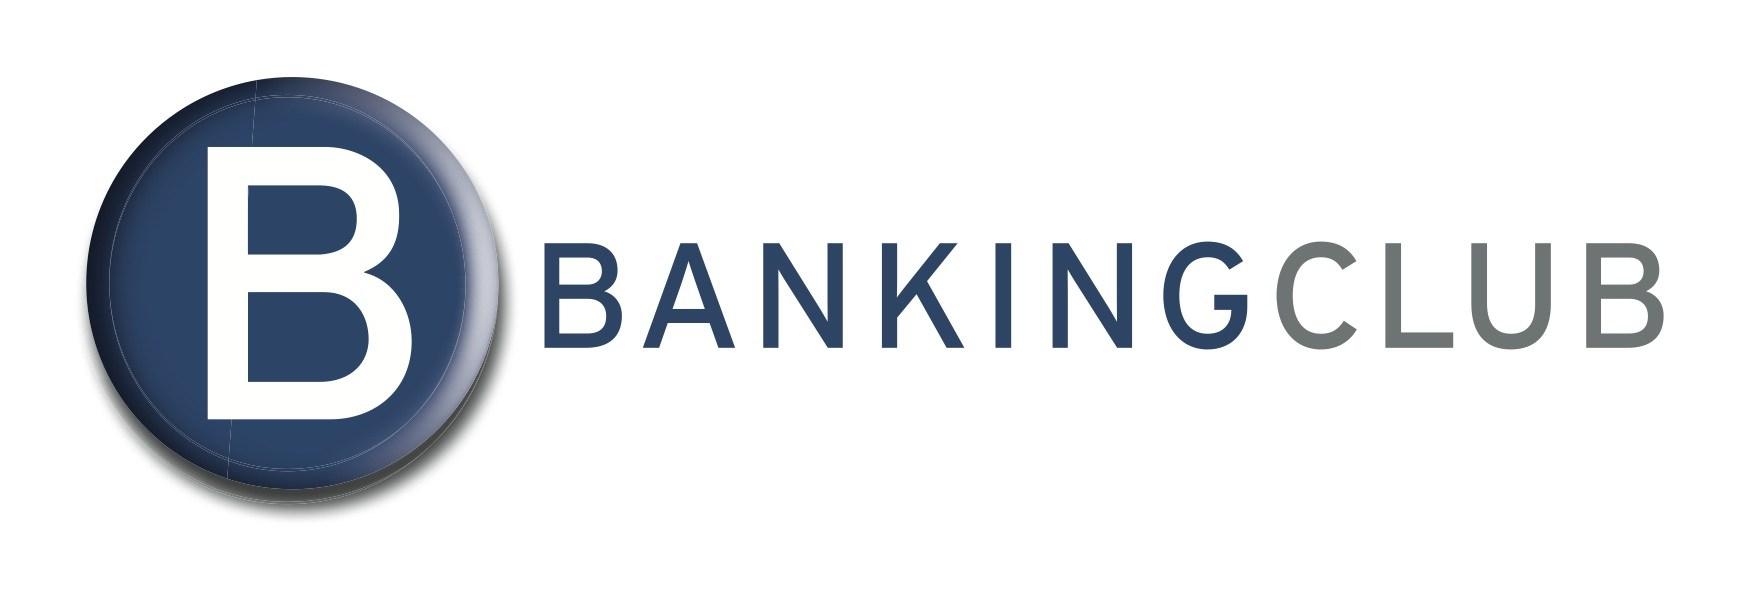 Banking_Club_Home_Myos_Finanzierung_FBA